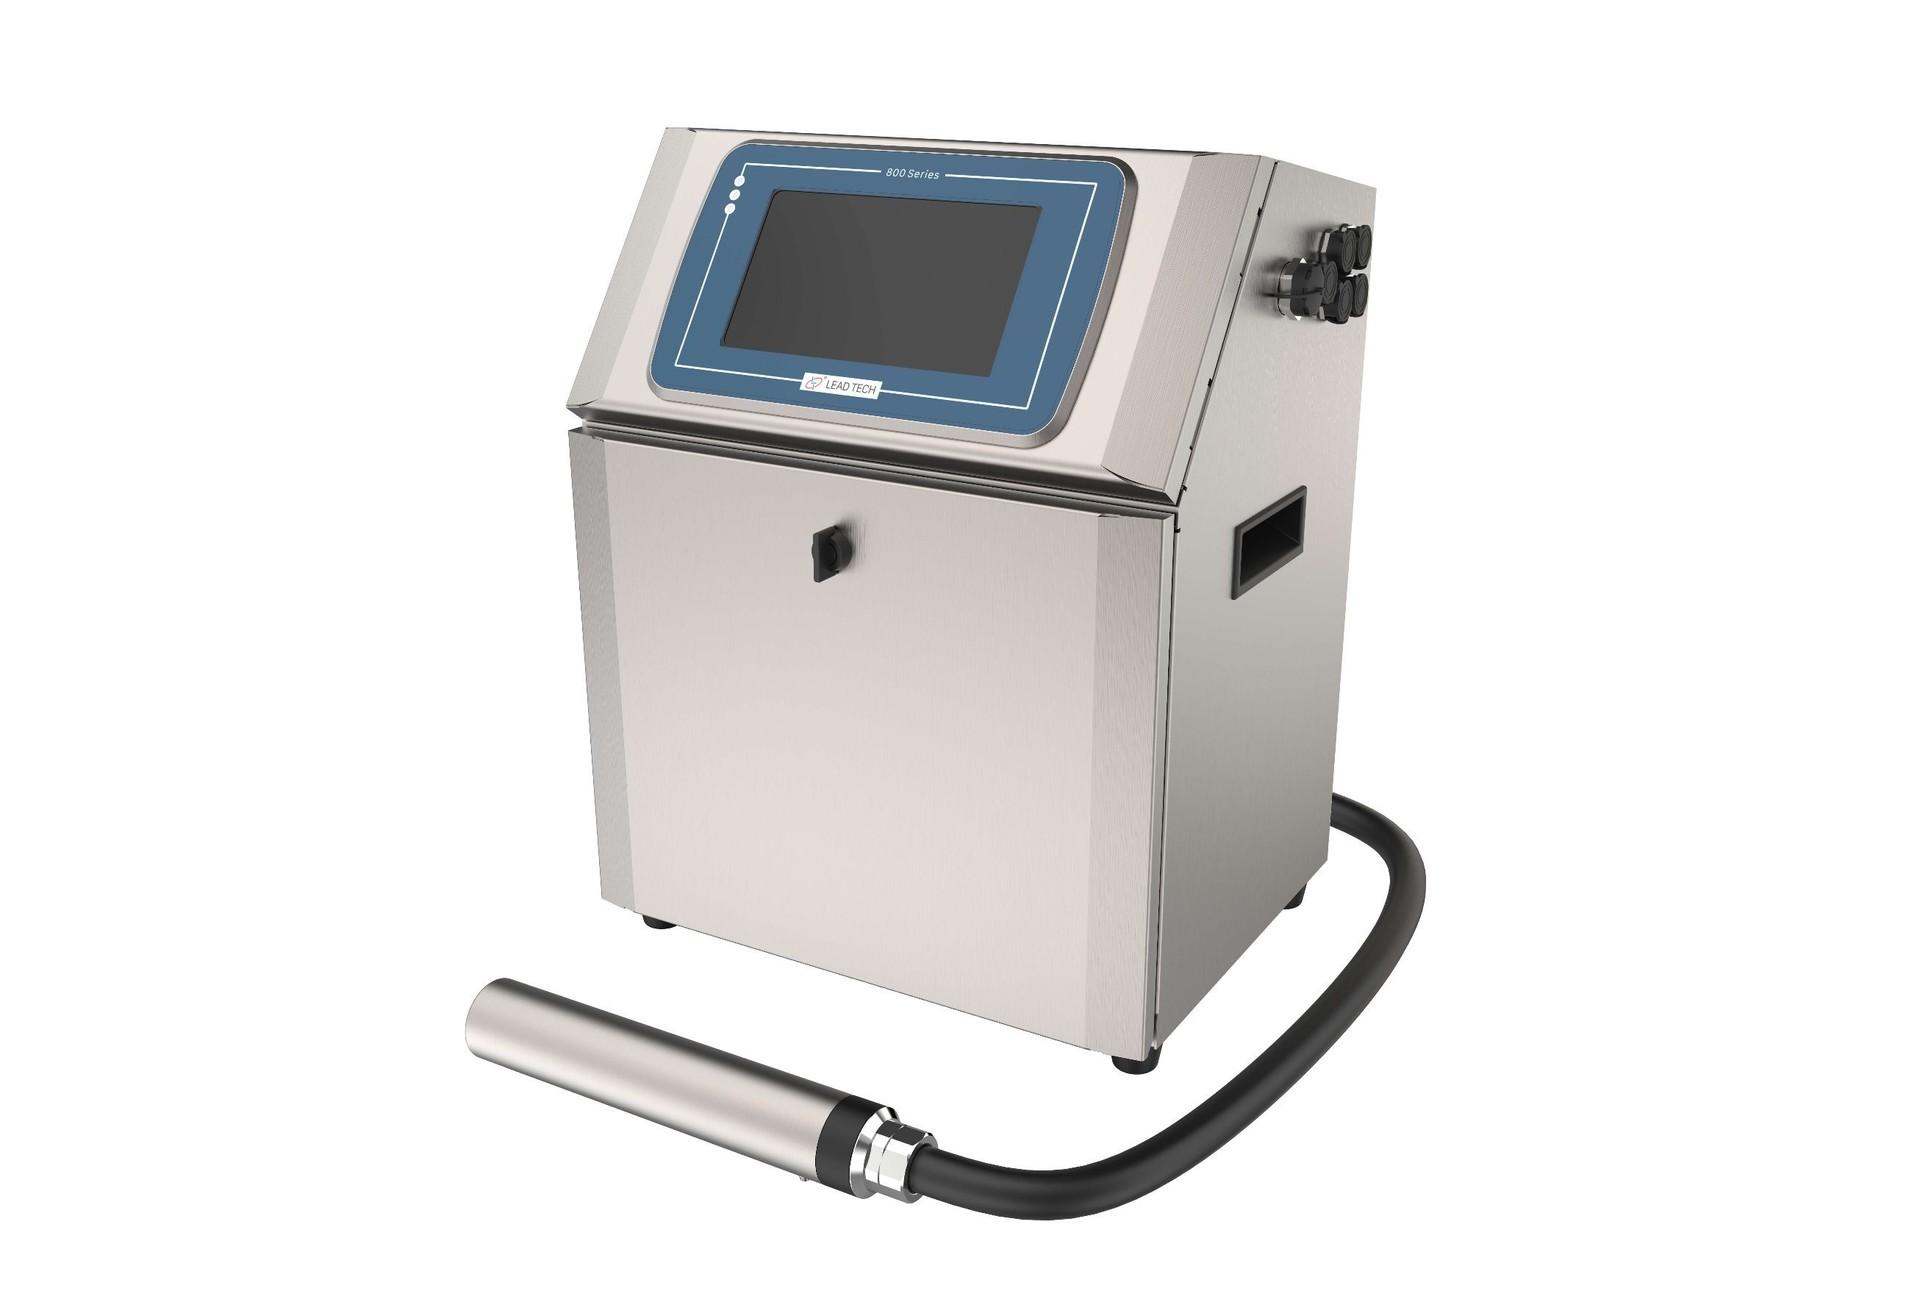 Lead Tech Lt800 Cij Expiry Date Inkjet Printer